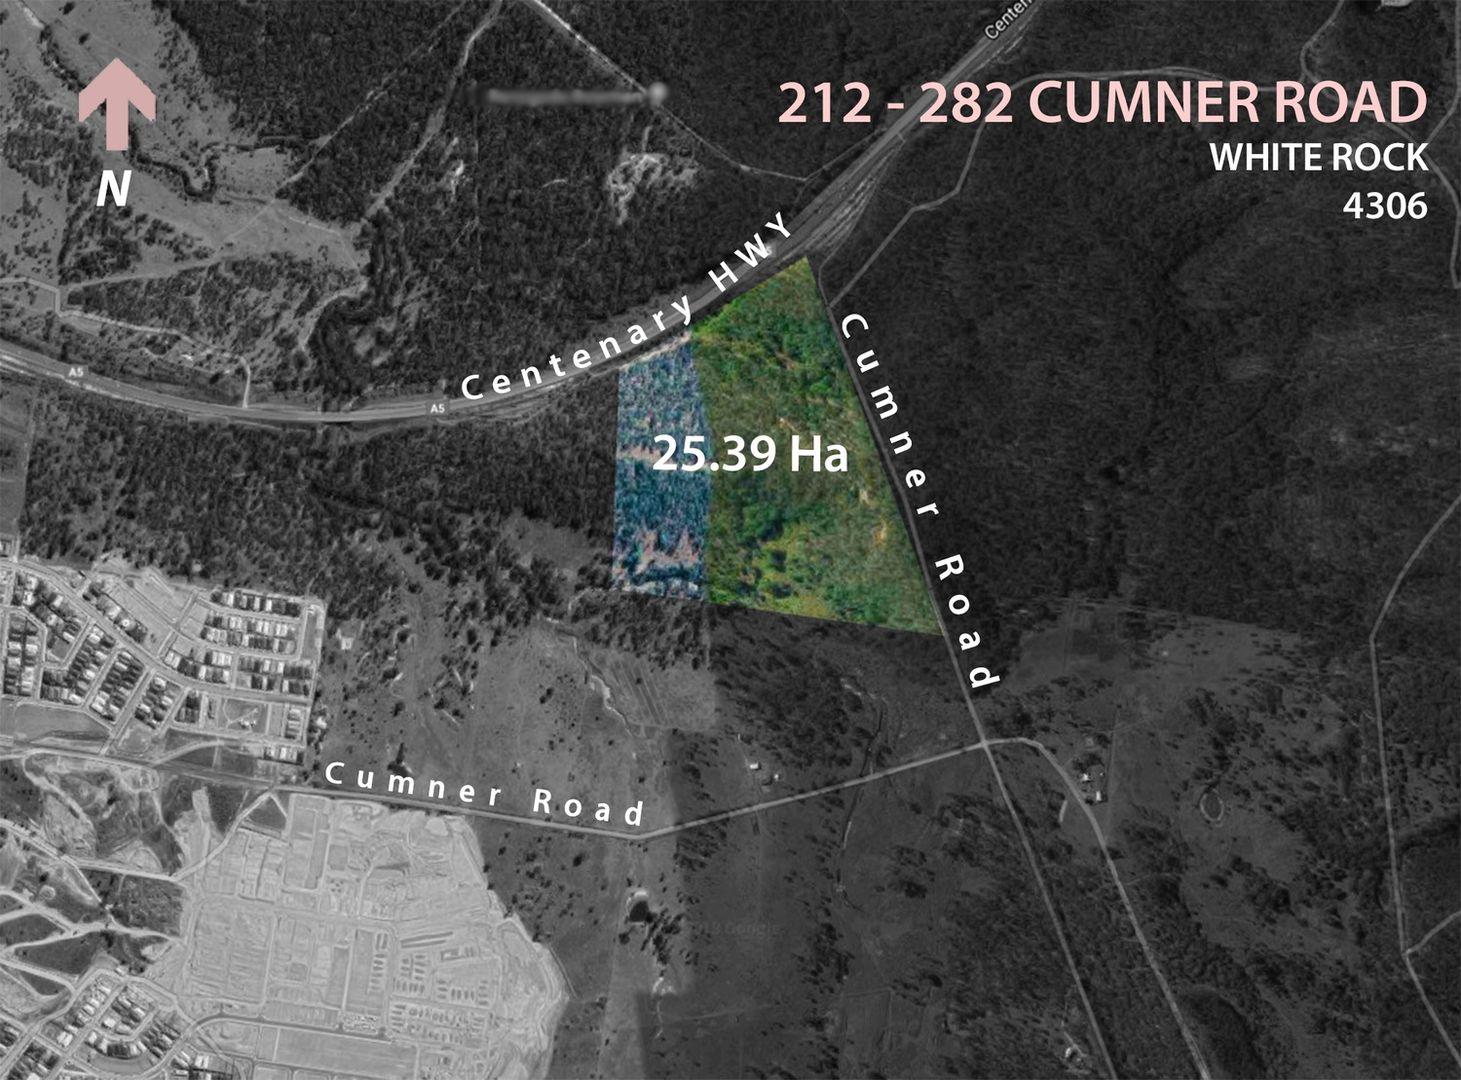 212-282 CUMNER Road, White Rock QLD 4306, Image 0